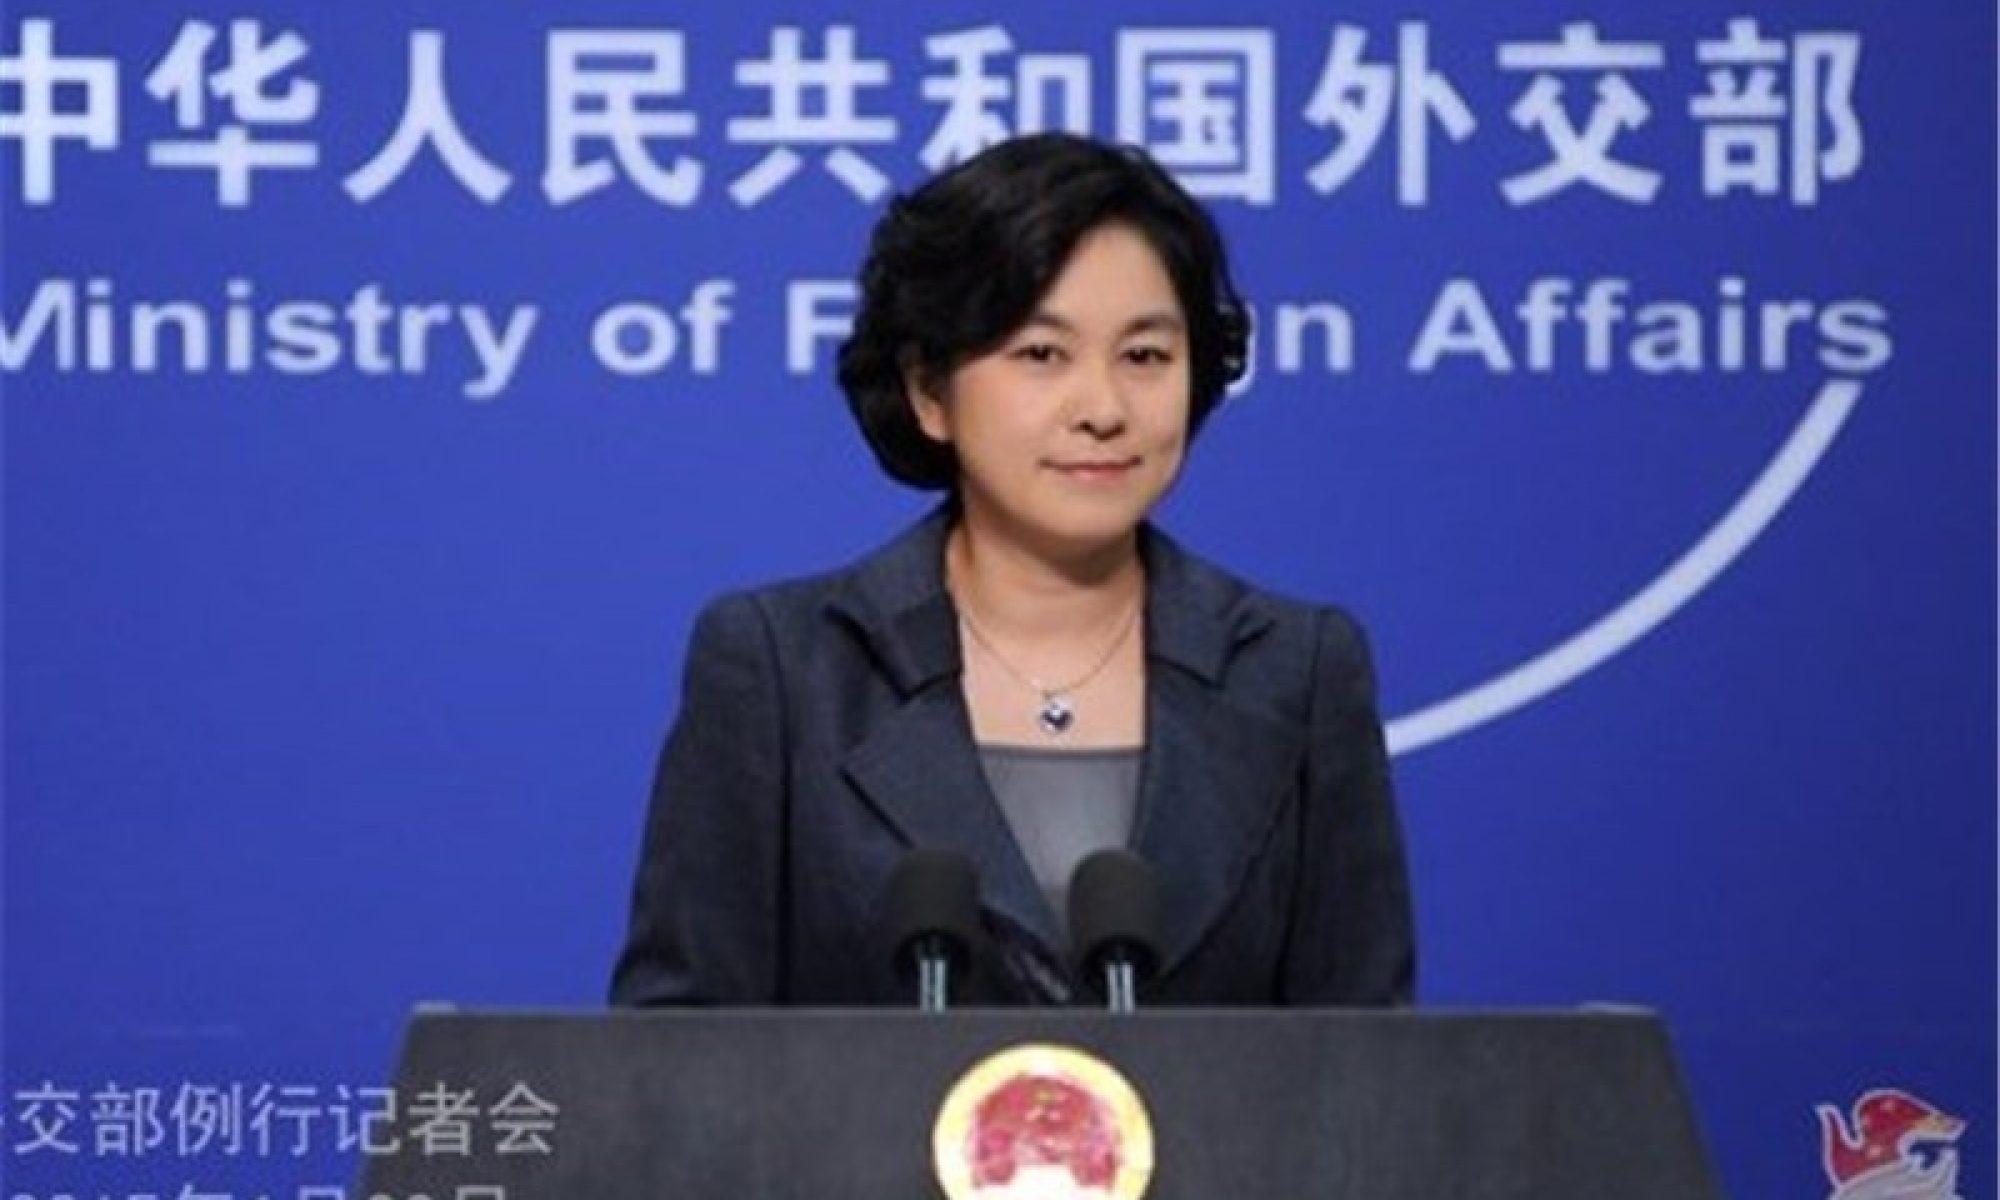 چین: ئامەریکا نکارە ب رەشکرنا ئالیێن دن ڤیروسا کۆرۆنا کۆنترۆل بکە